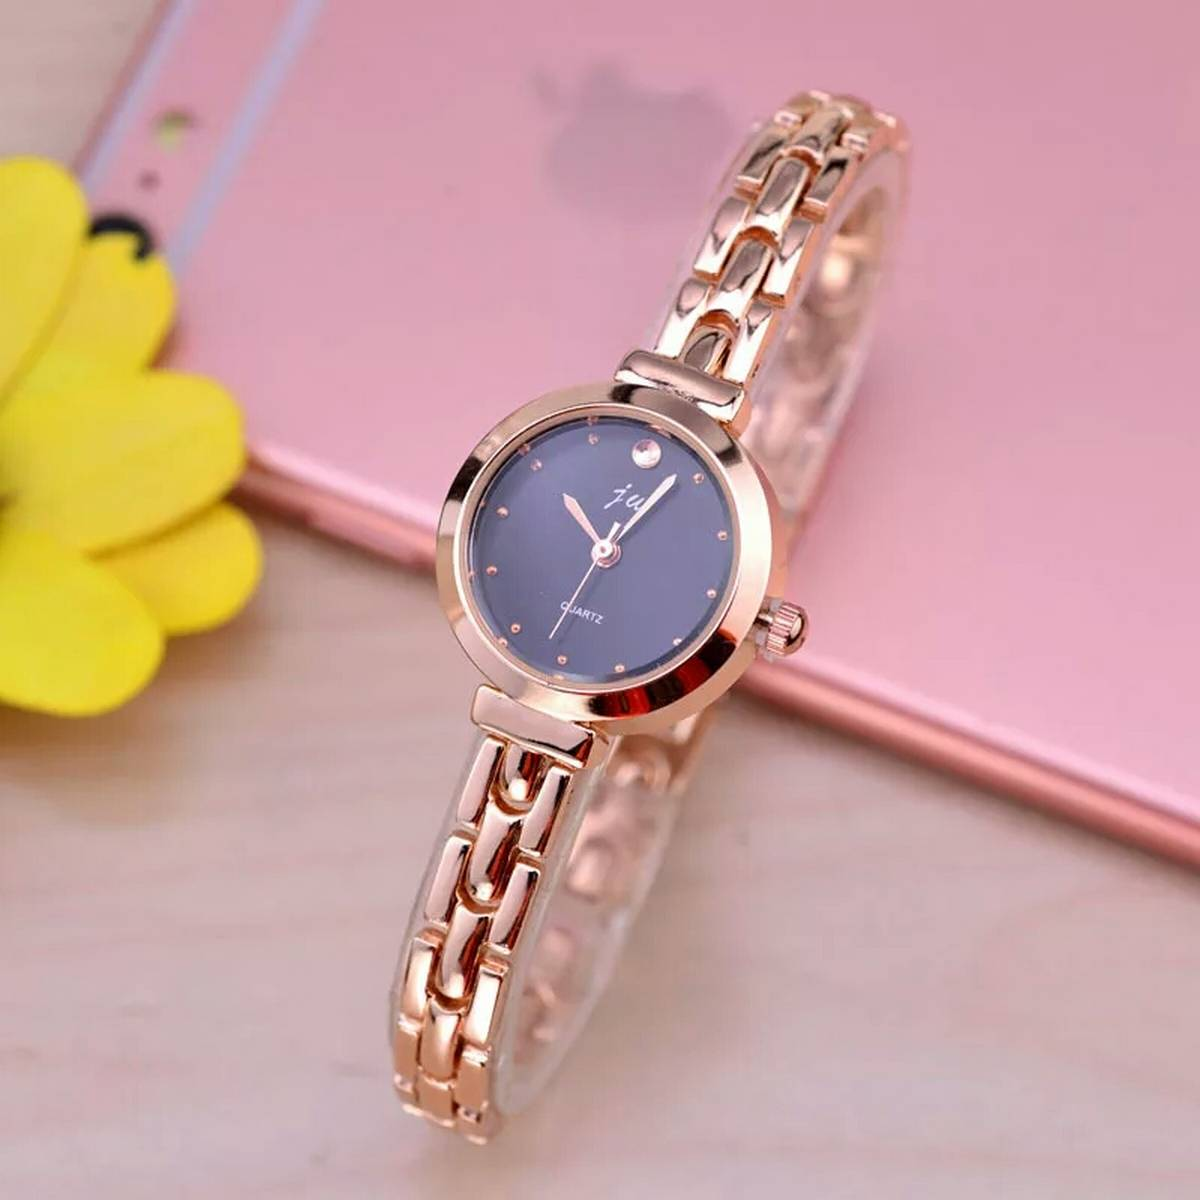 Ladies Magnetic Starry Sky Clock Luxury Women Watches Fashion Diamond Female Quartz Wristwatches With Free Gift Box